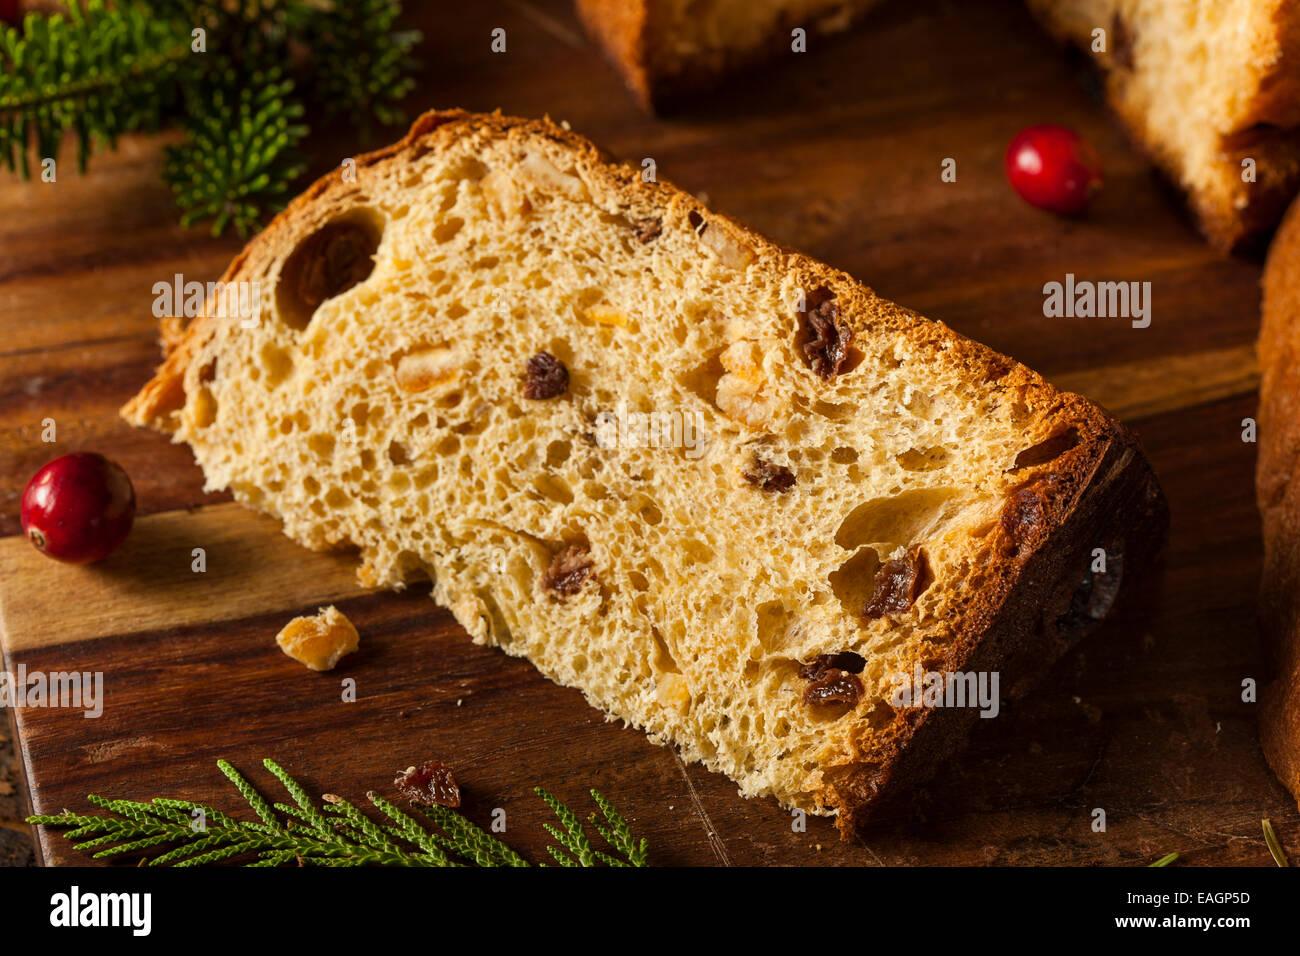 Homemade Panettone Fruit Cake Ready for Christmas Stock Photo